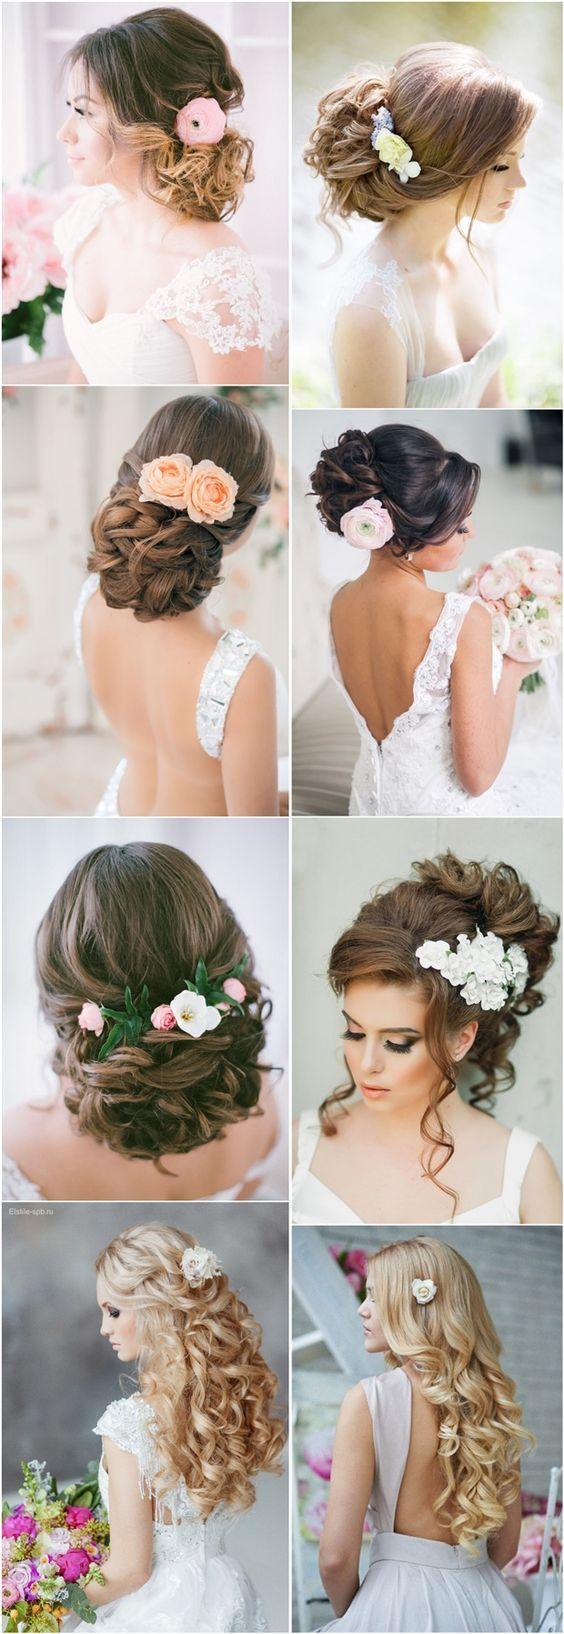 30 romantic wedding hairstyles for long hair | wedding, deer and